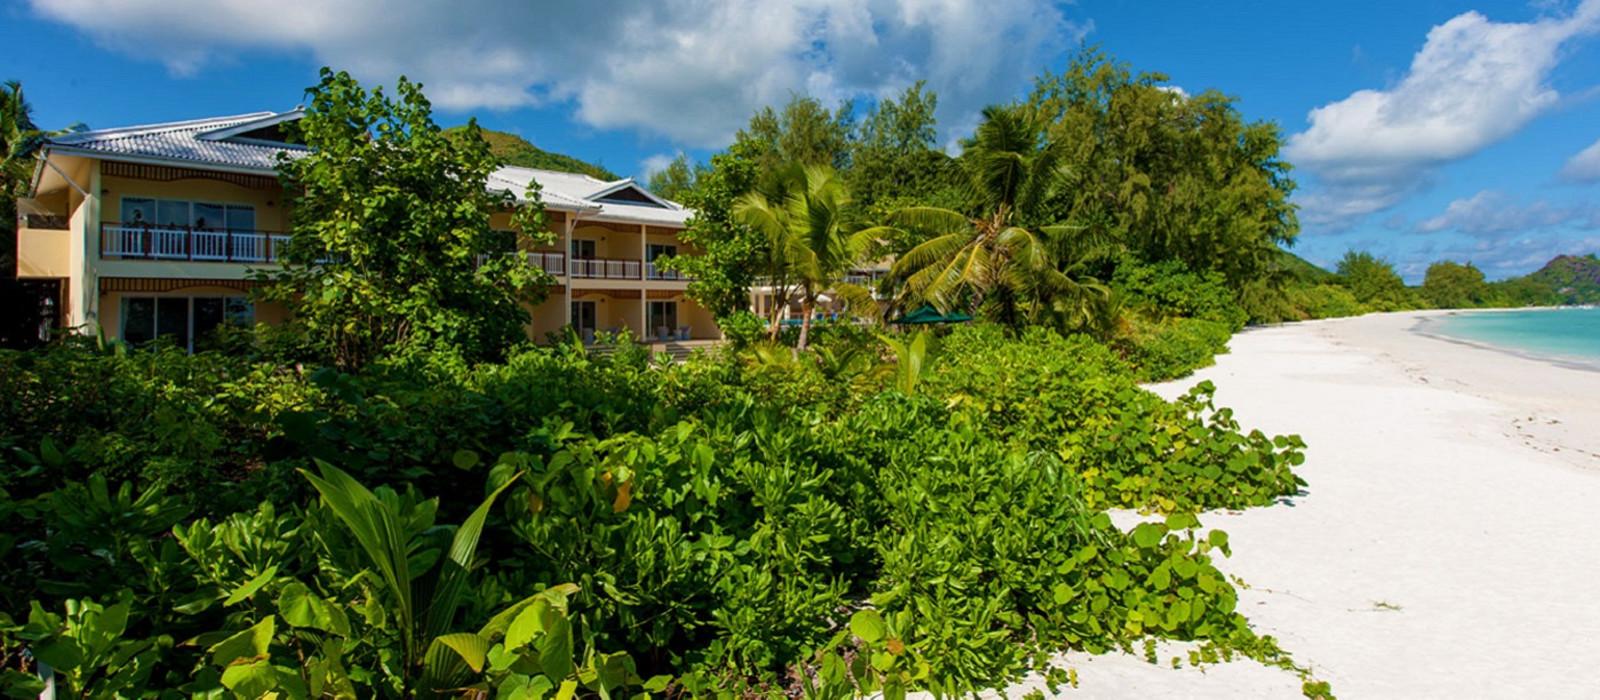 Hotel Acajou Beach Resort Seychelles